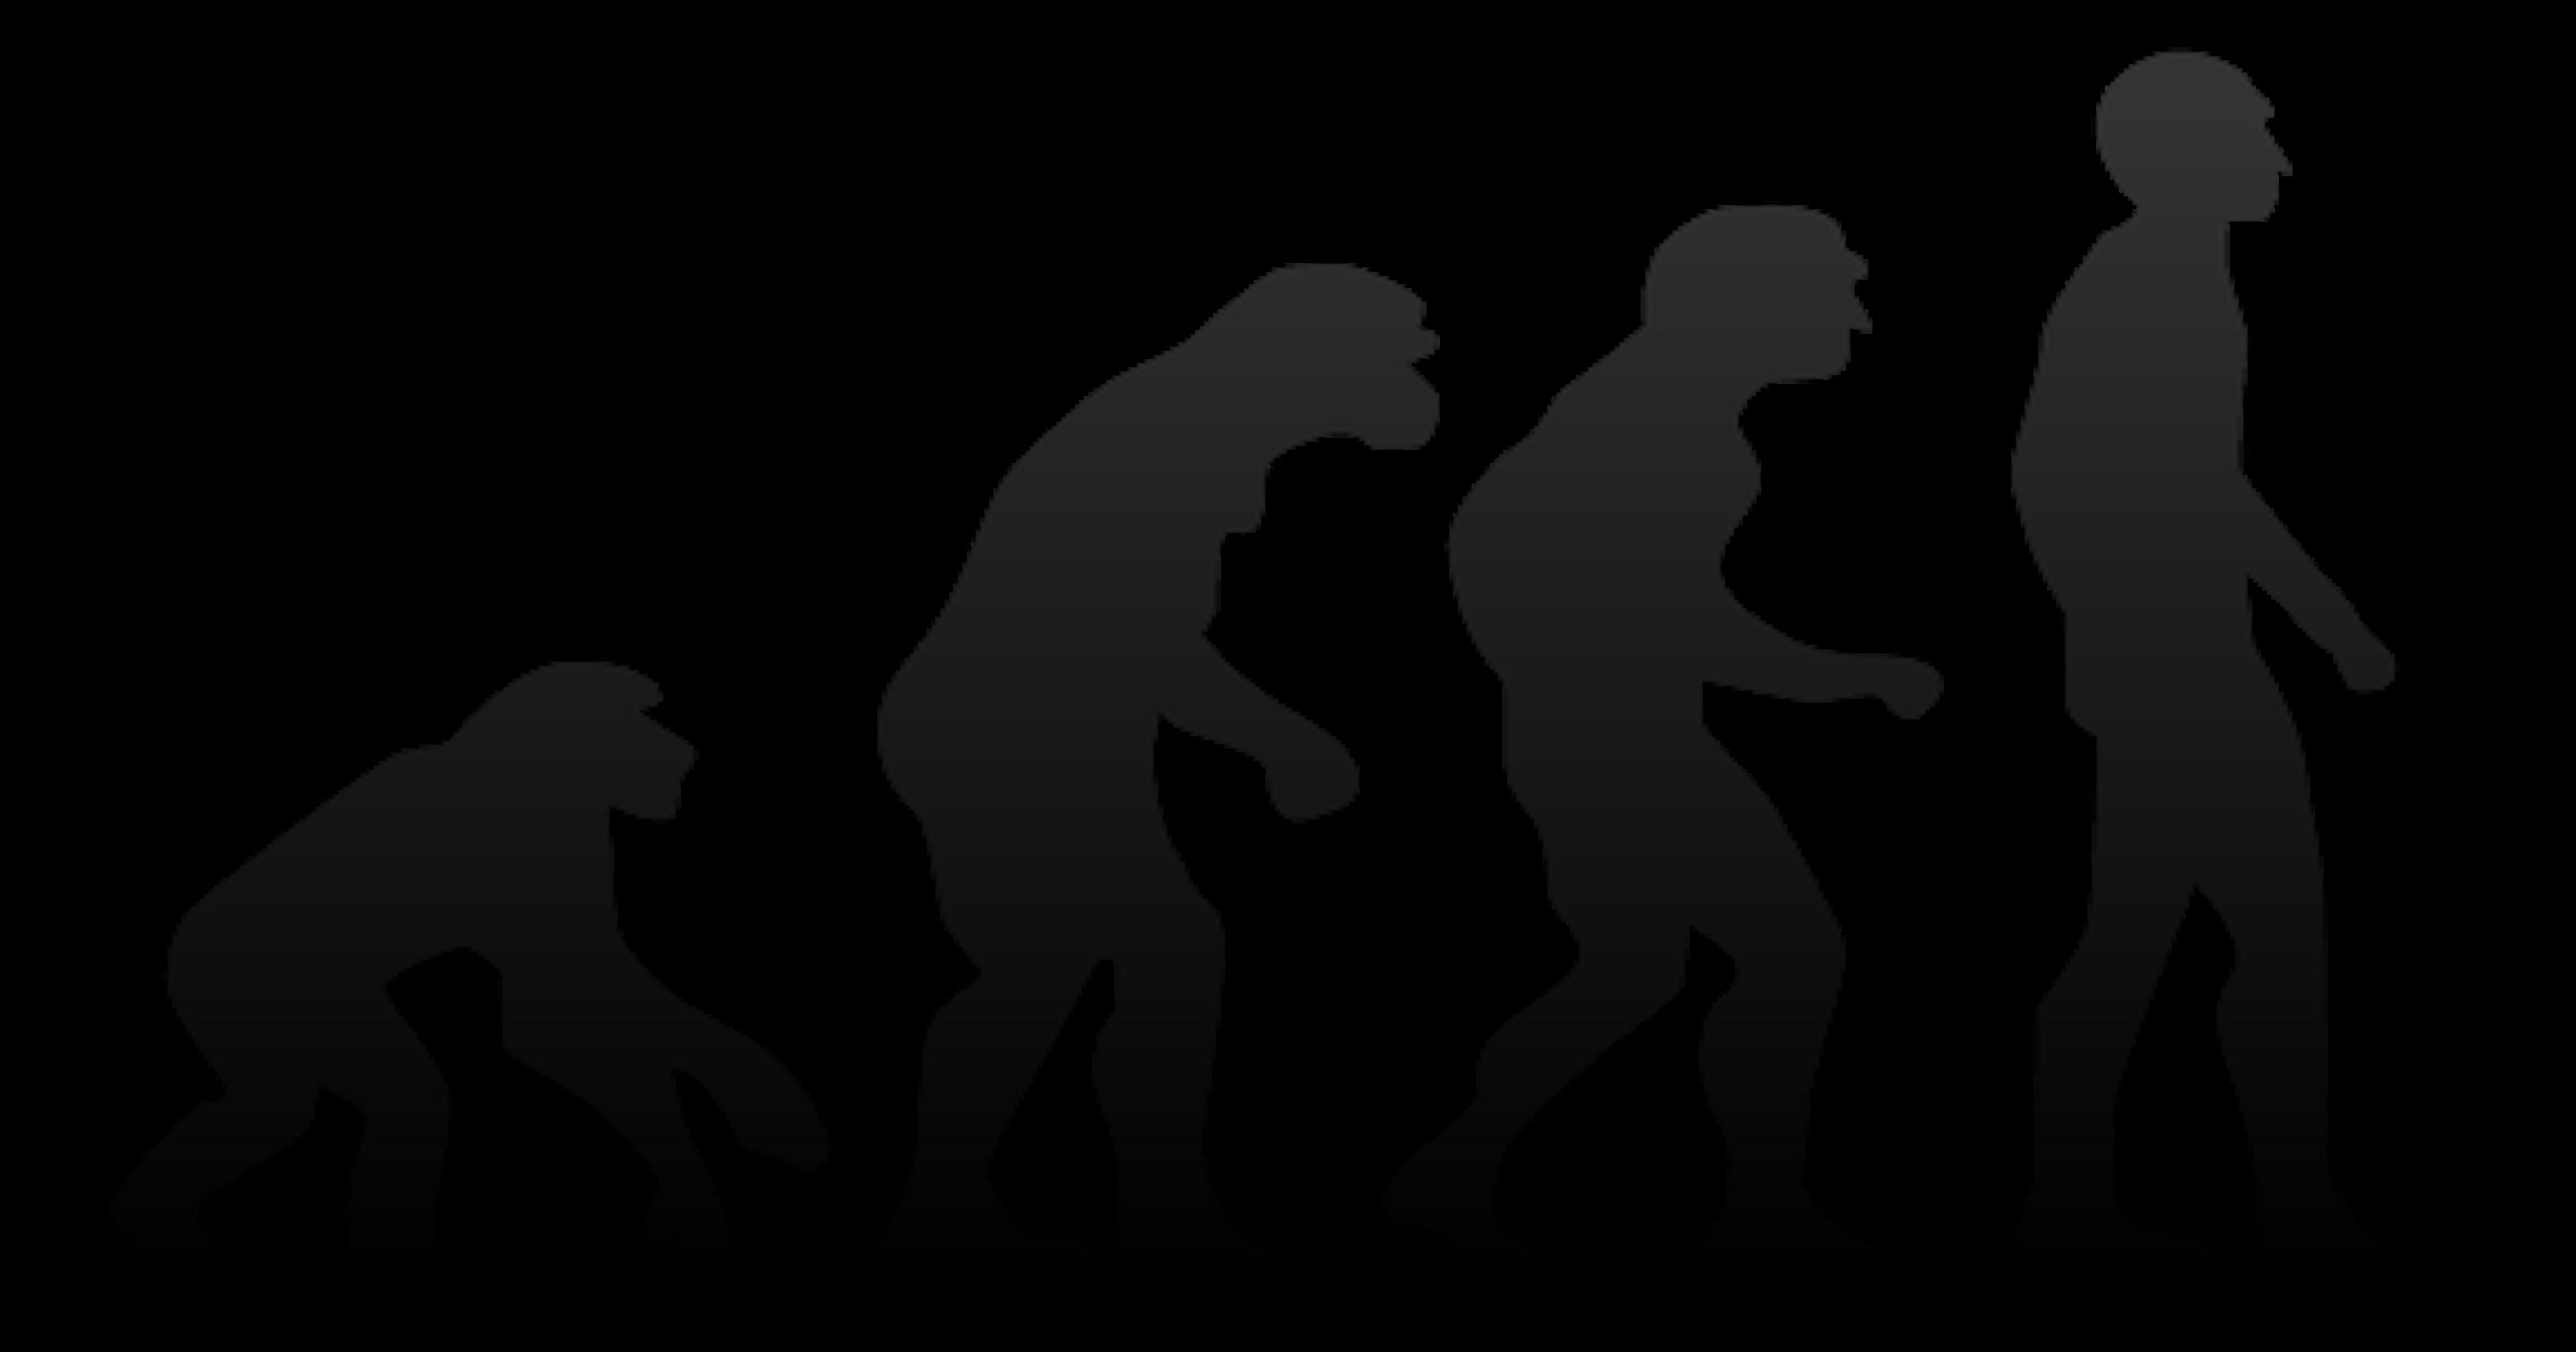 evolution lesson changes will make arizona kids dumber teachers say